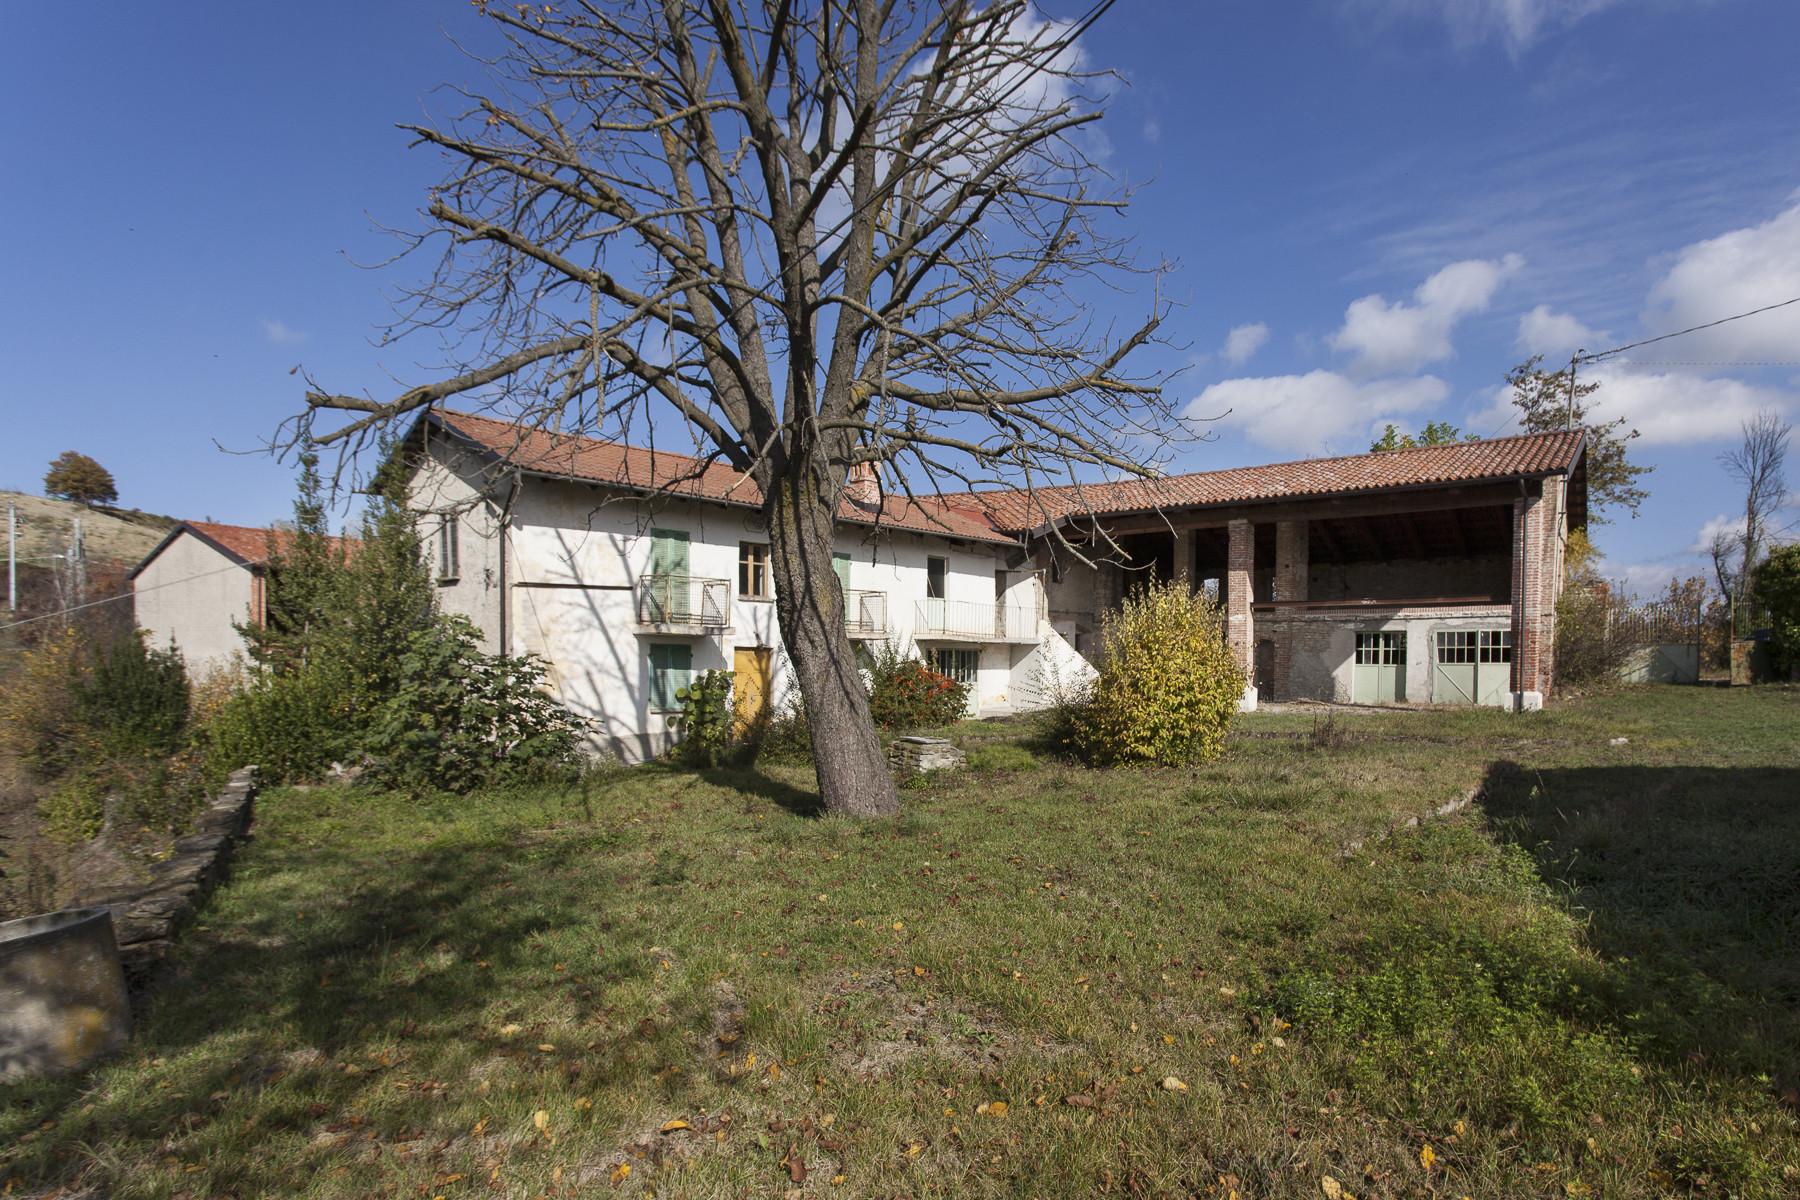 Villa in Vendita a Clavesana: 5 locali, 1130 mq - Foto 7